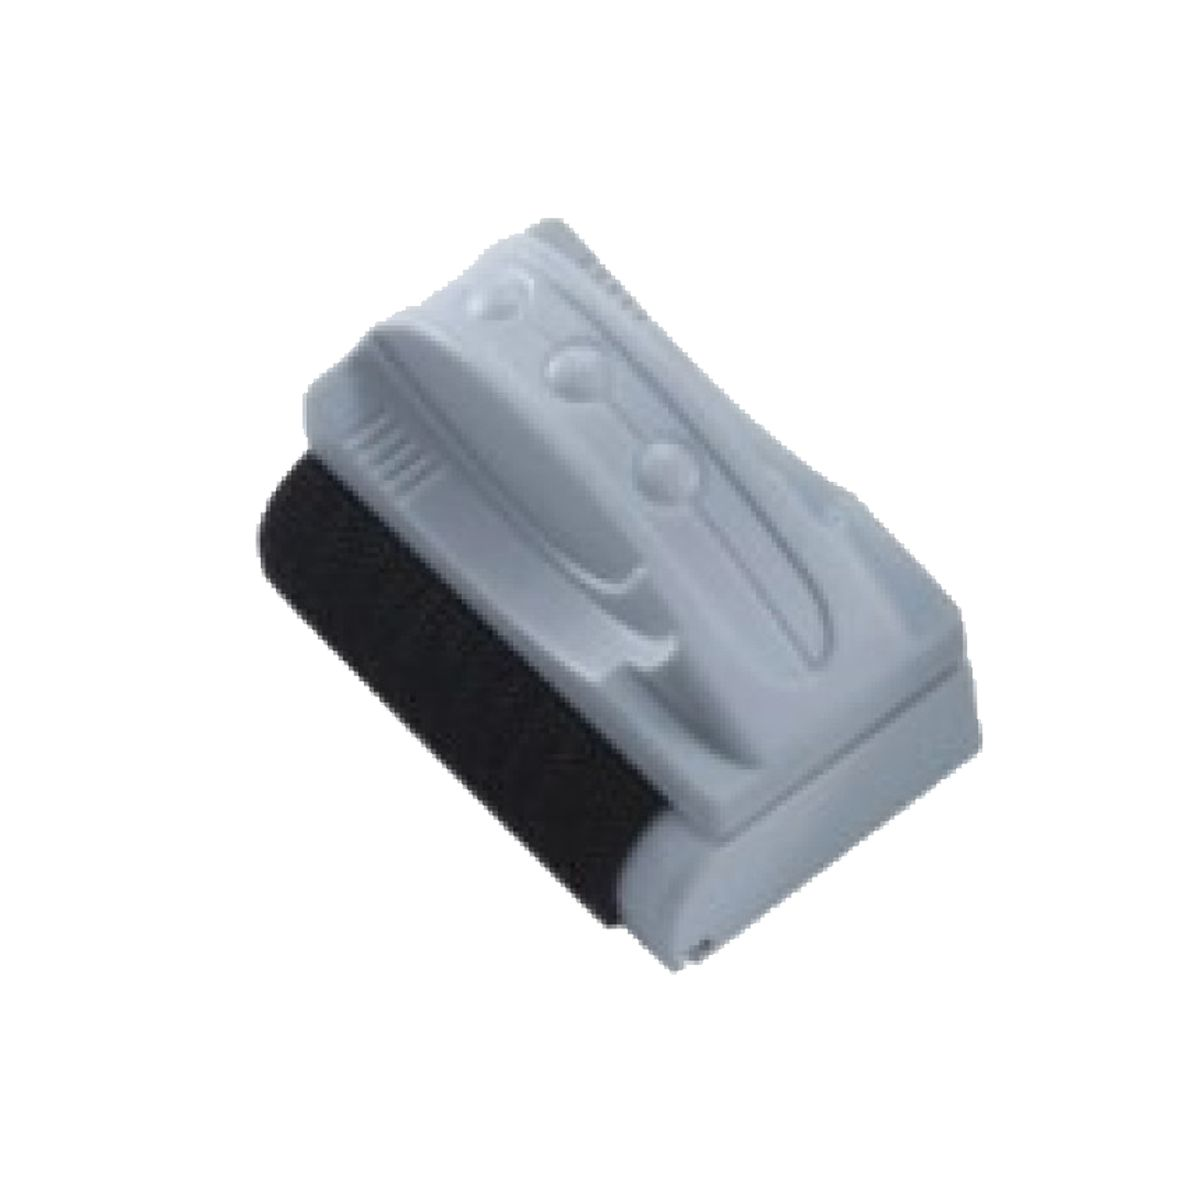 Limpador Magnético Flutuante Boyu WD-901A Vidro Curvo 3mm